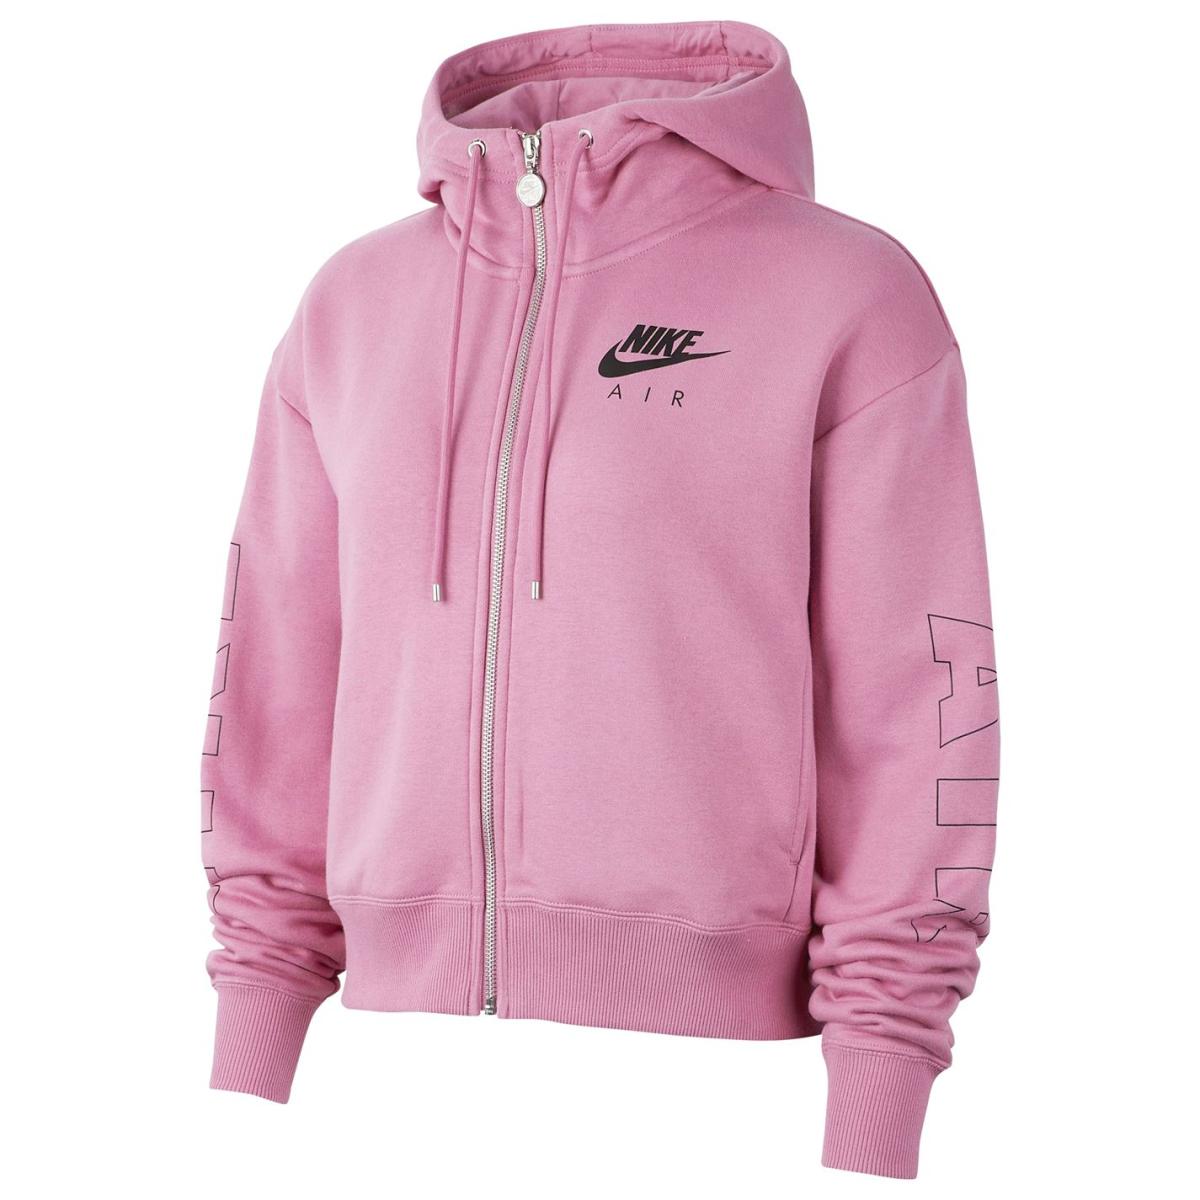 Nike Air Kapuzenjacke Jacke Damen Sweatshirt Kapuzenpullover Pullover 2333